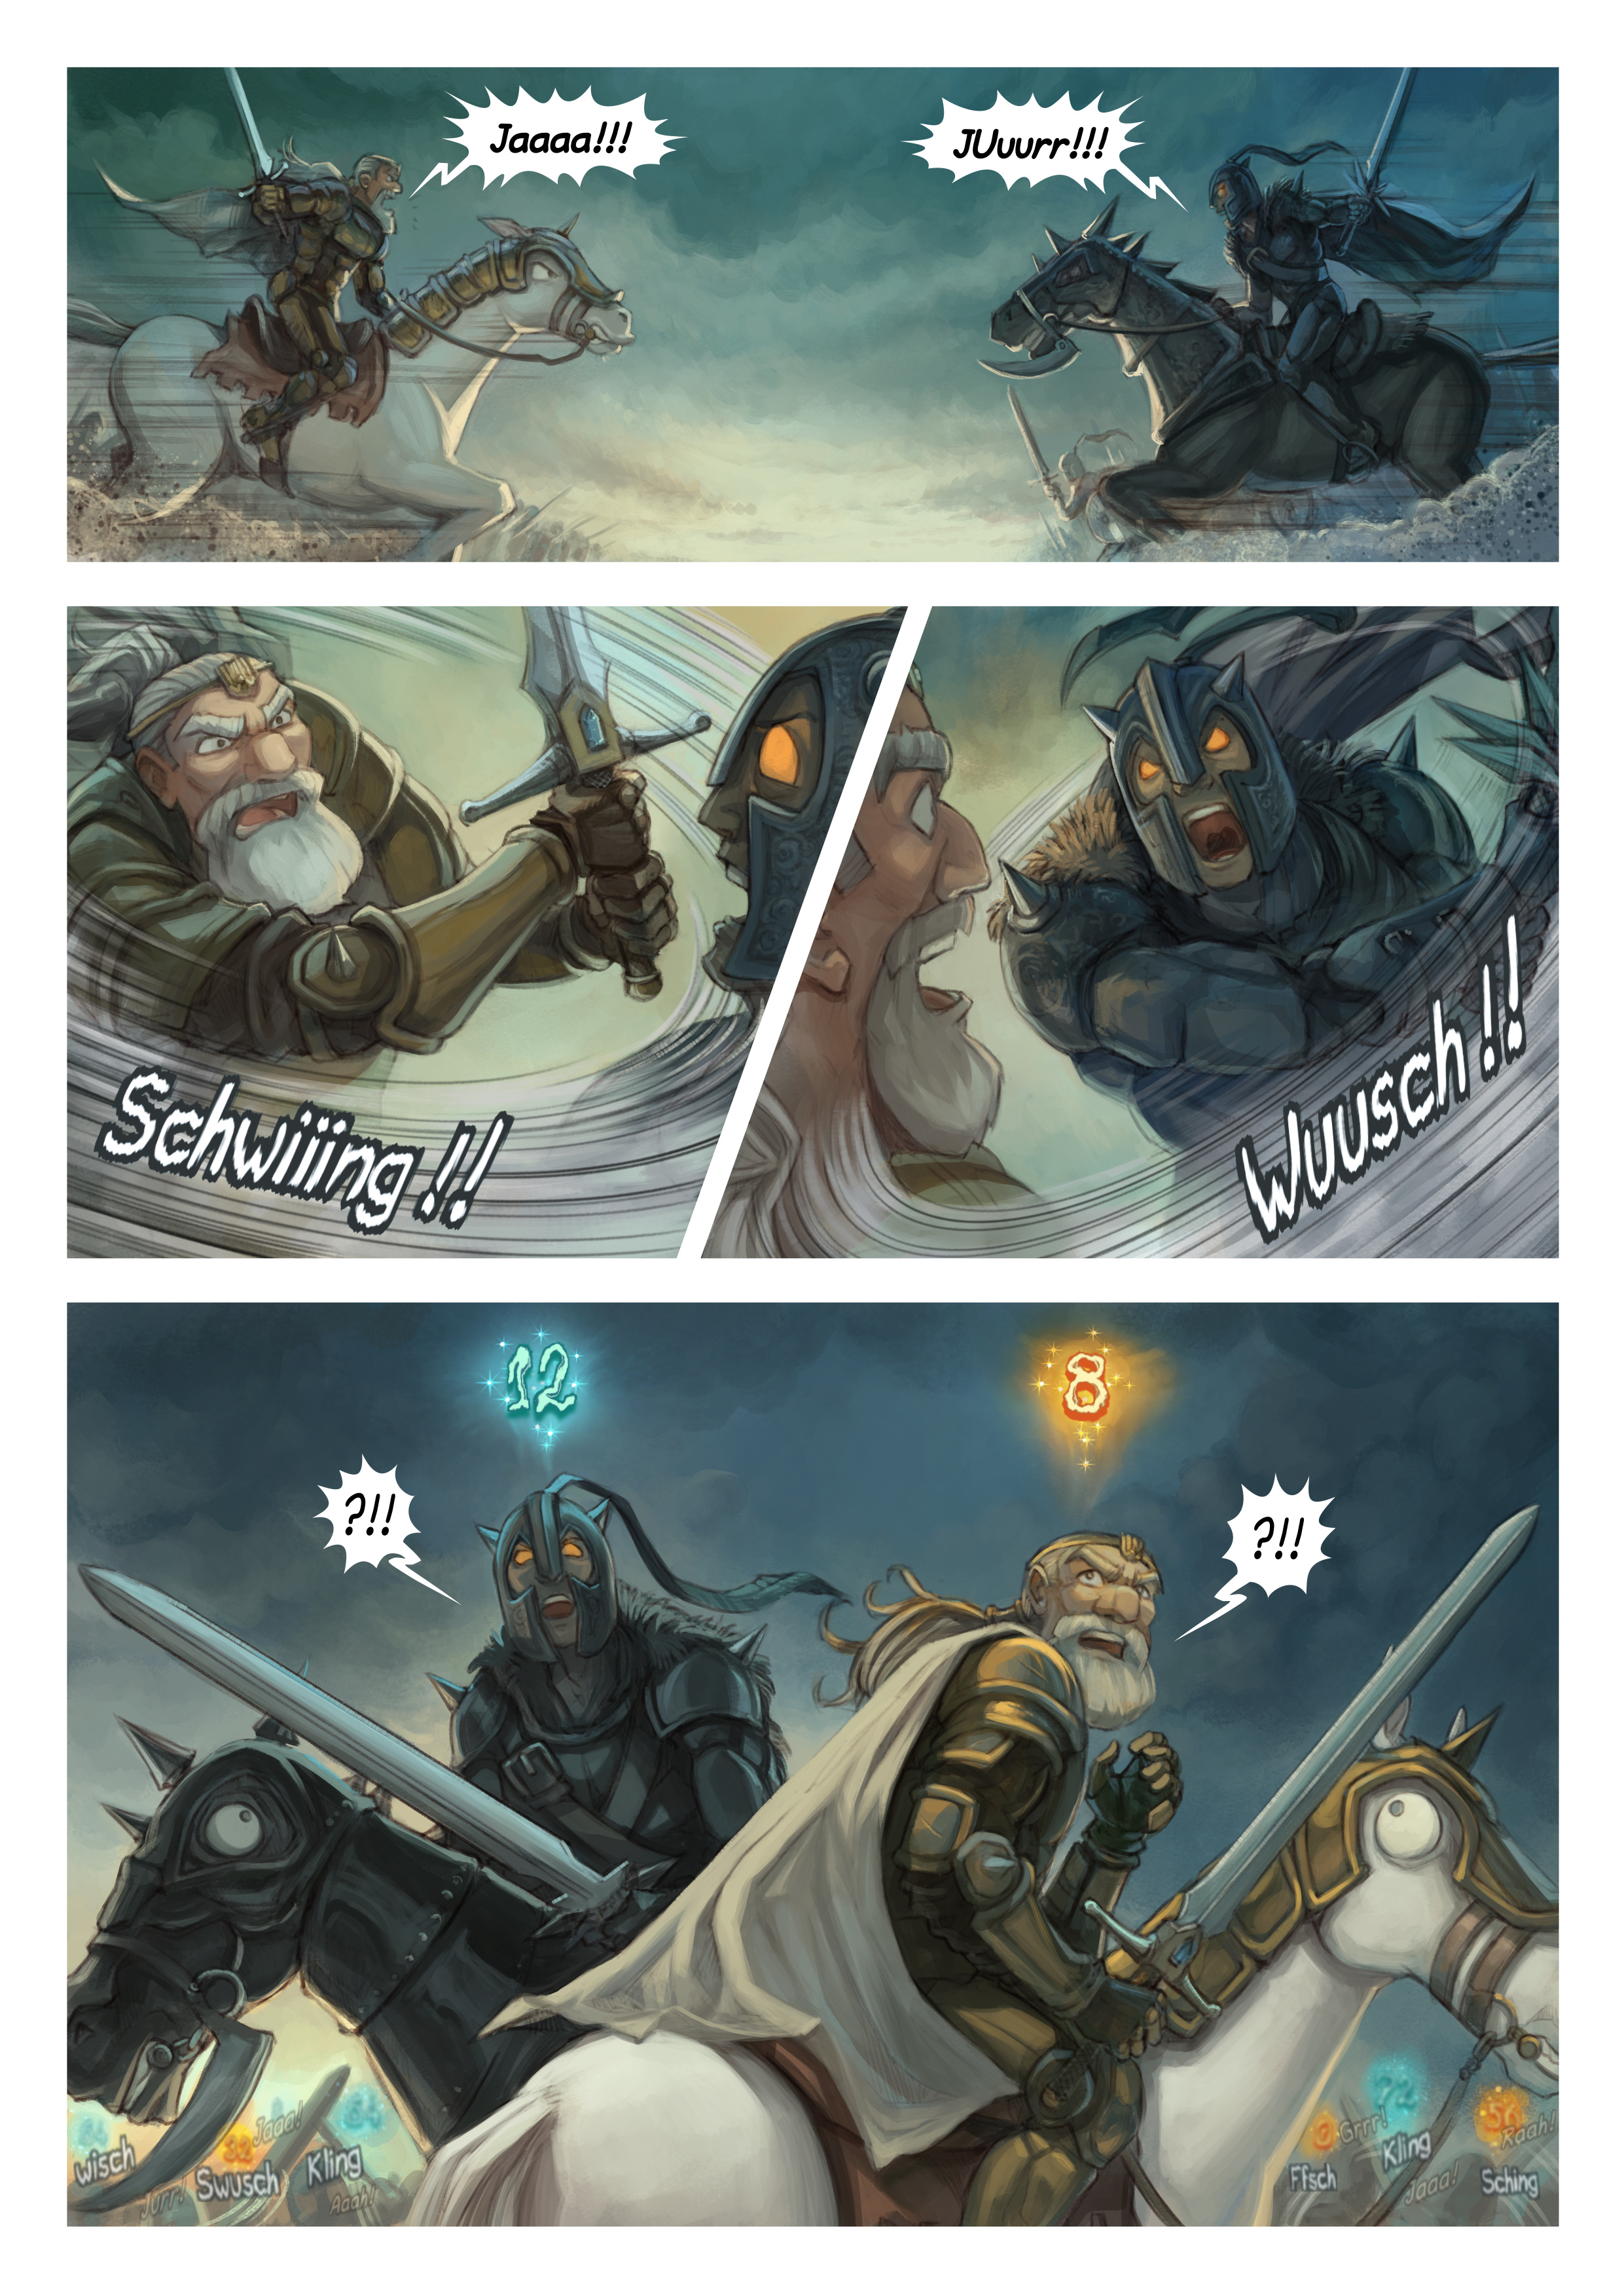 Episode 33: Zauberhafter Krieg, Page 5